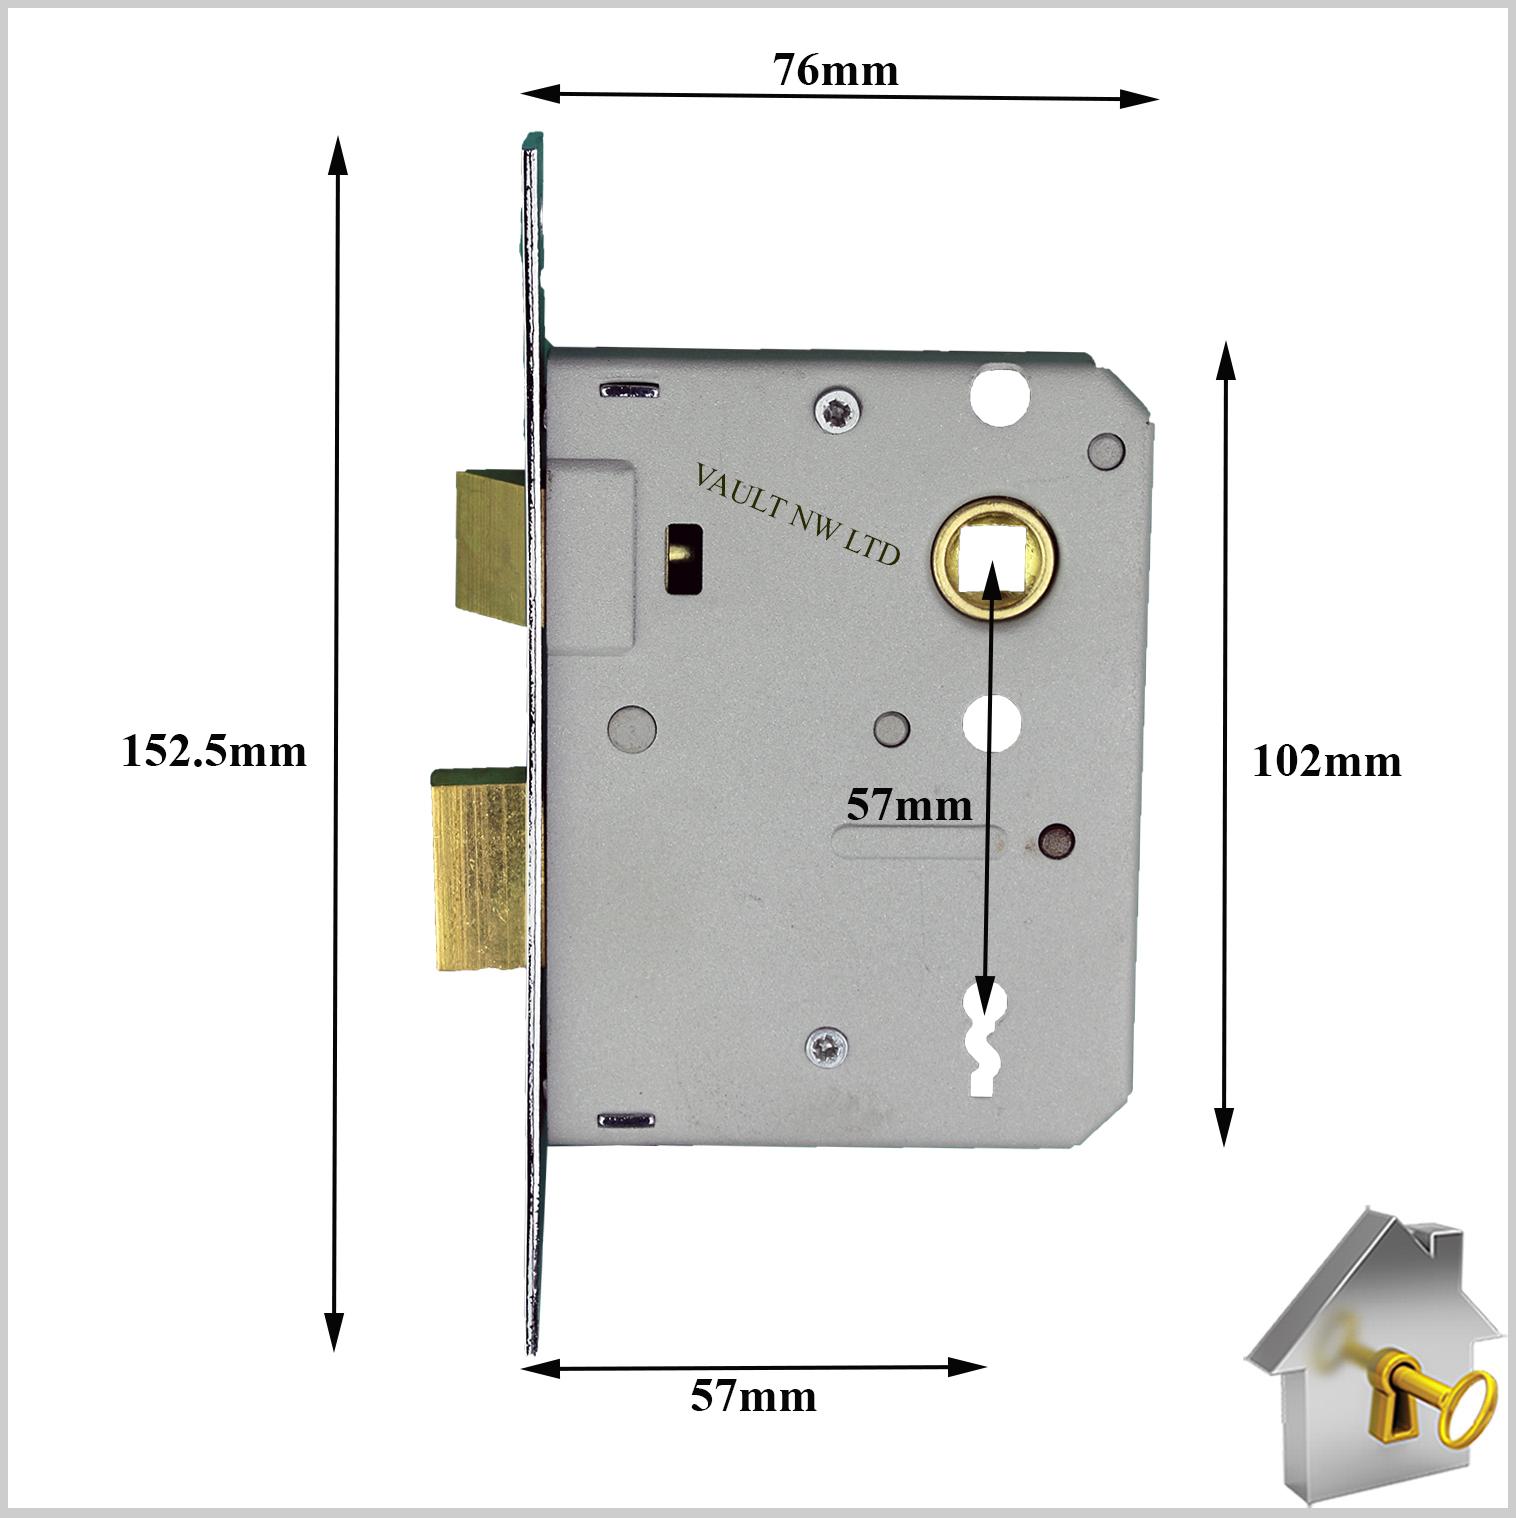 3 Lever Era Sash Lock Fortress Mortice British Standard Door Mortise Diagram 76mm